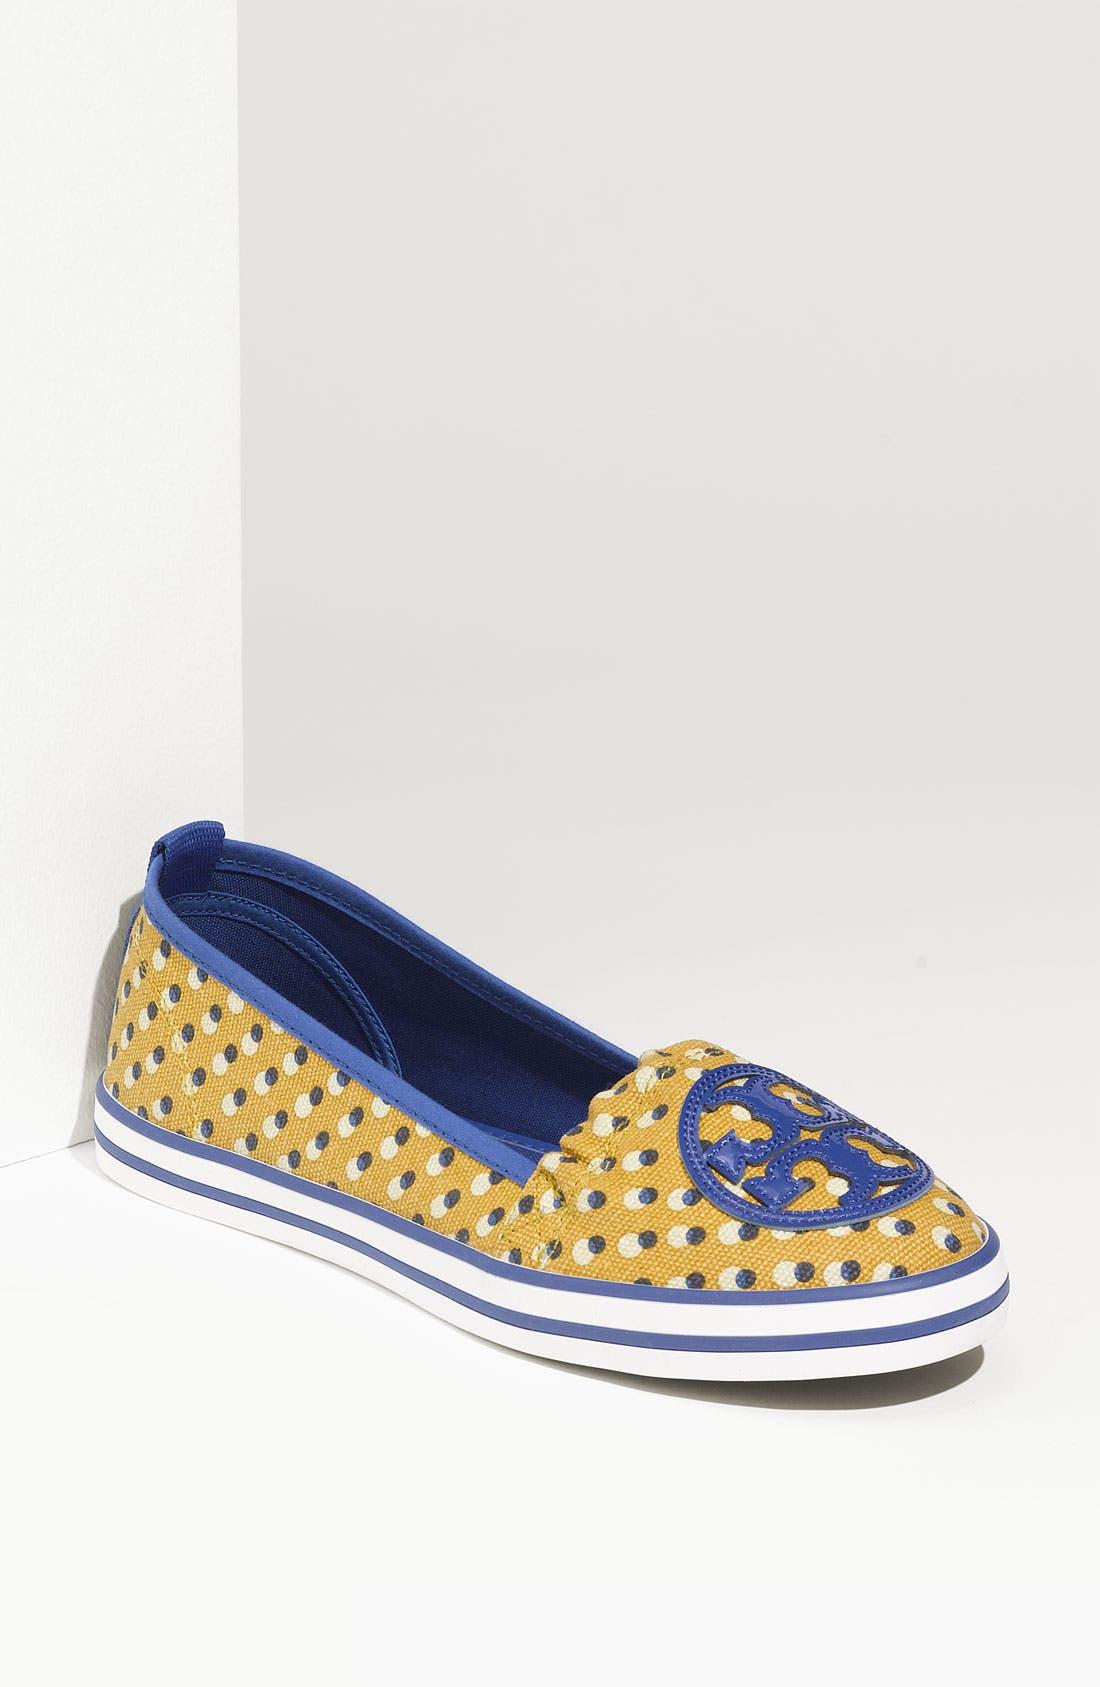 Alternate Image 1 Selected - Tory Burch Slip On Sneaker